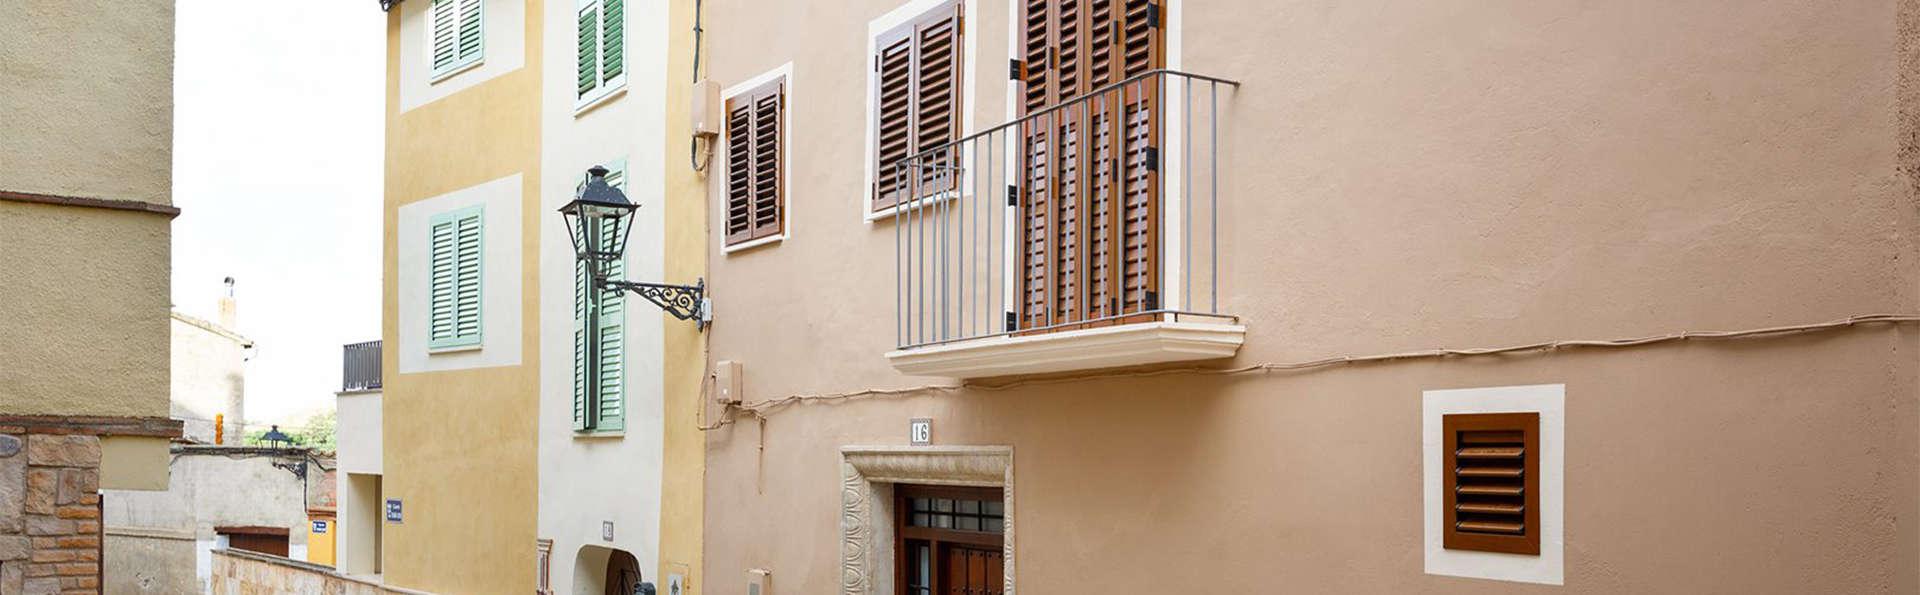 El Pilaret - EDIT_street1.jpg